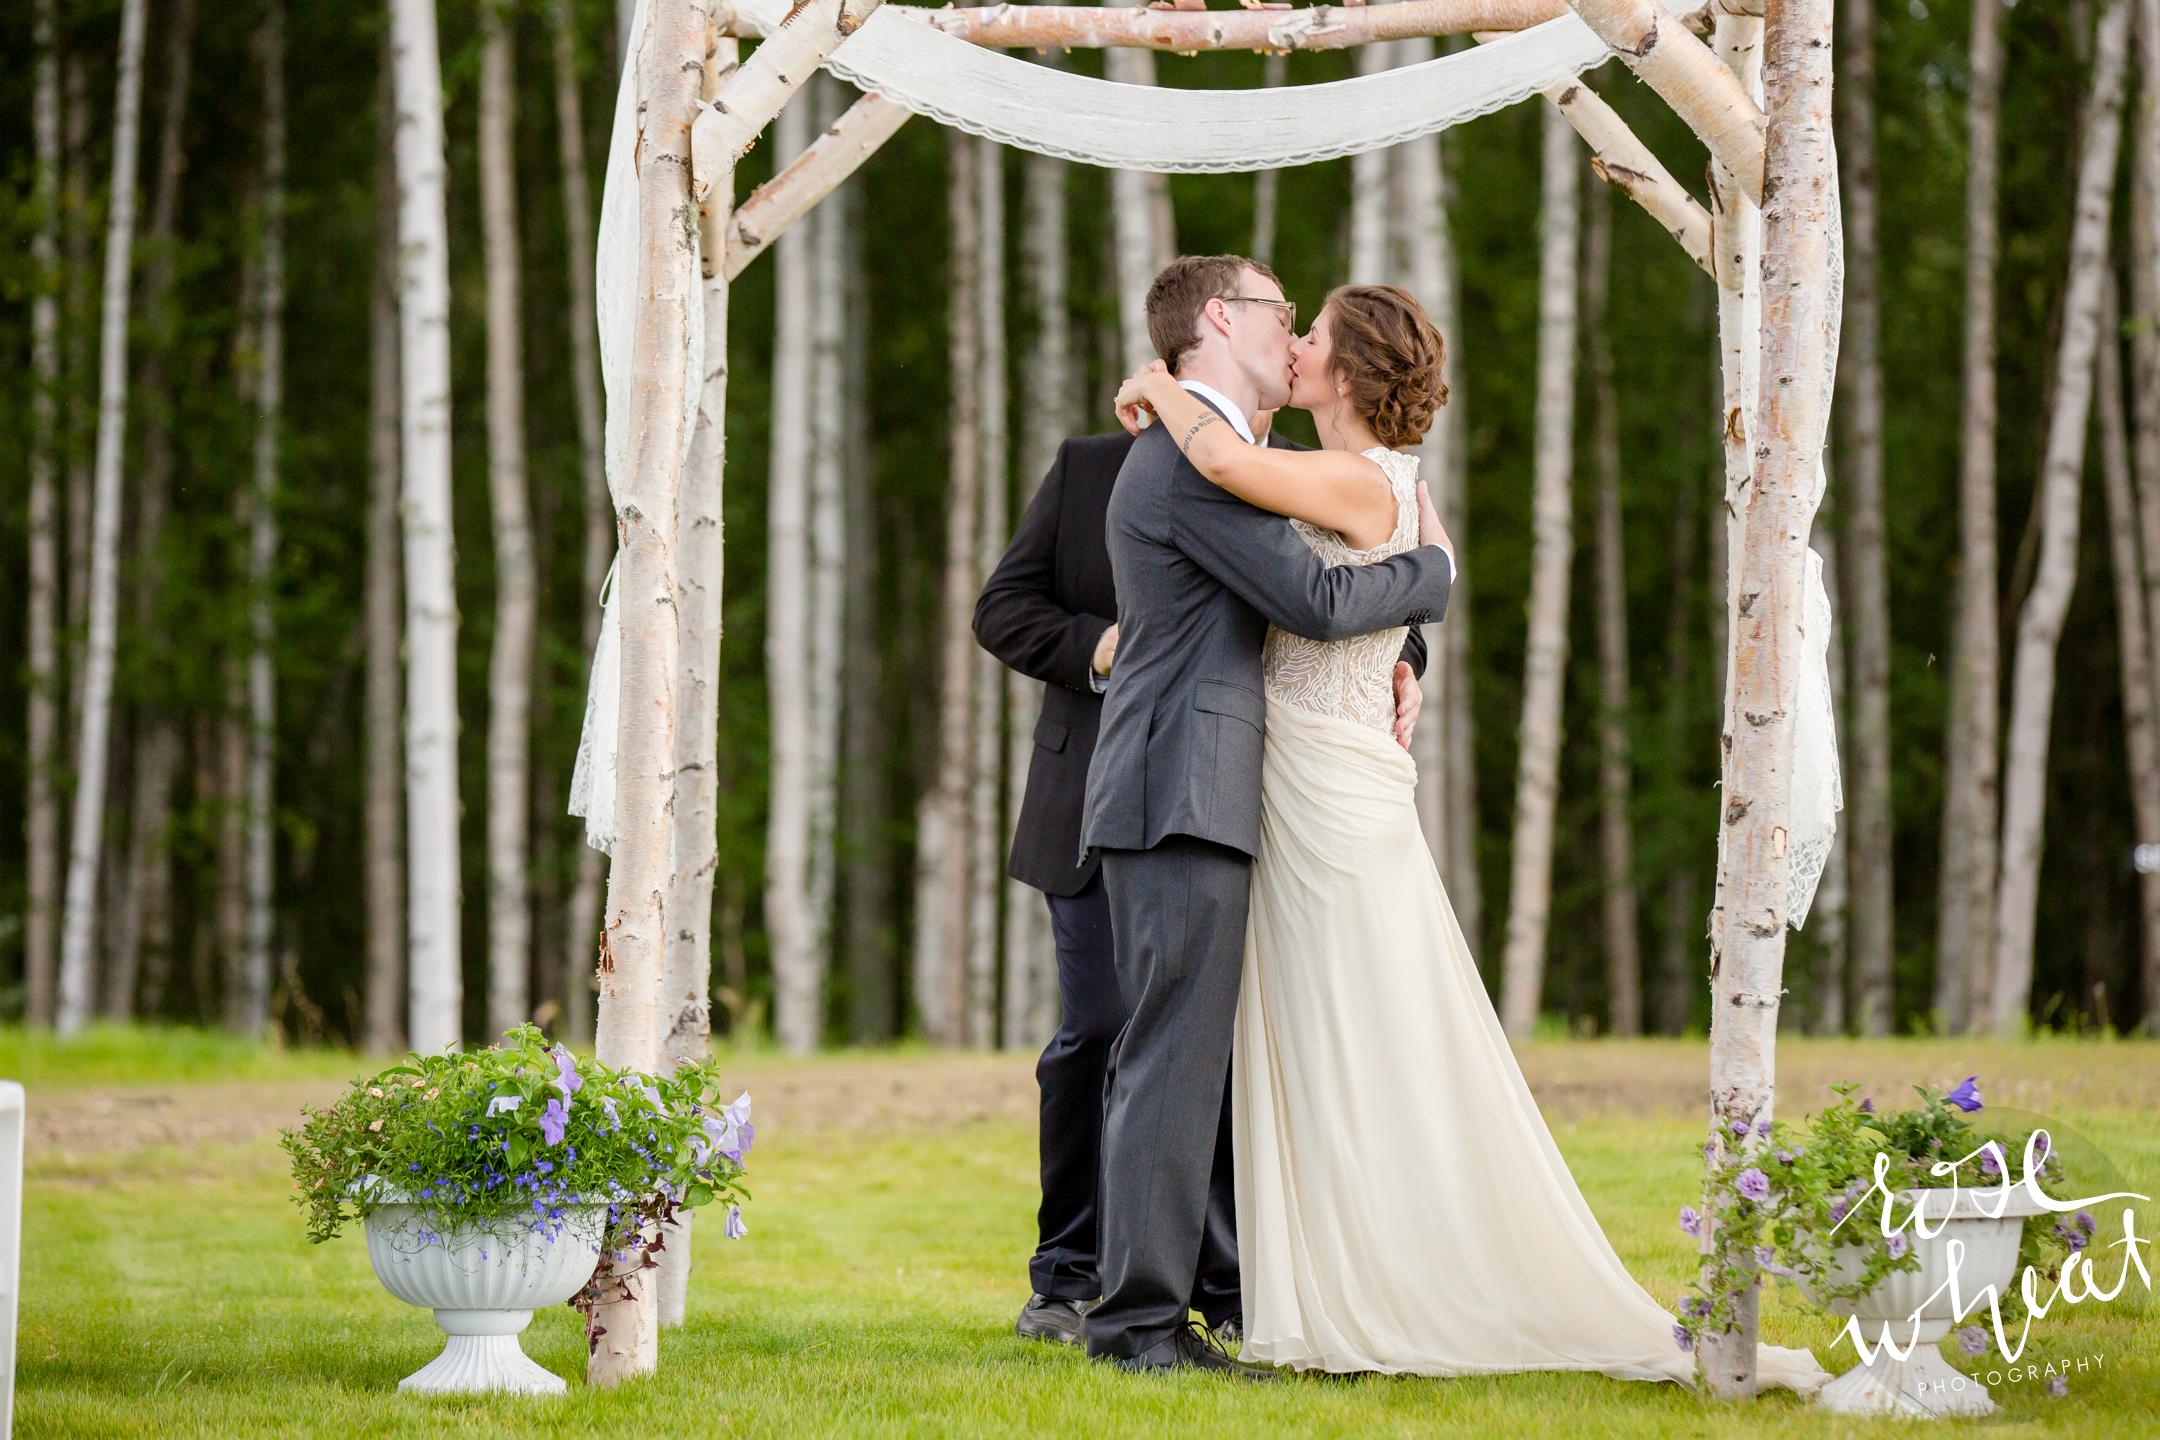 12. Birch_Hill_Fairbanks_Ak_Wedding_Rose_Wheat_Photogrpahy-1.jpg-16.jpg